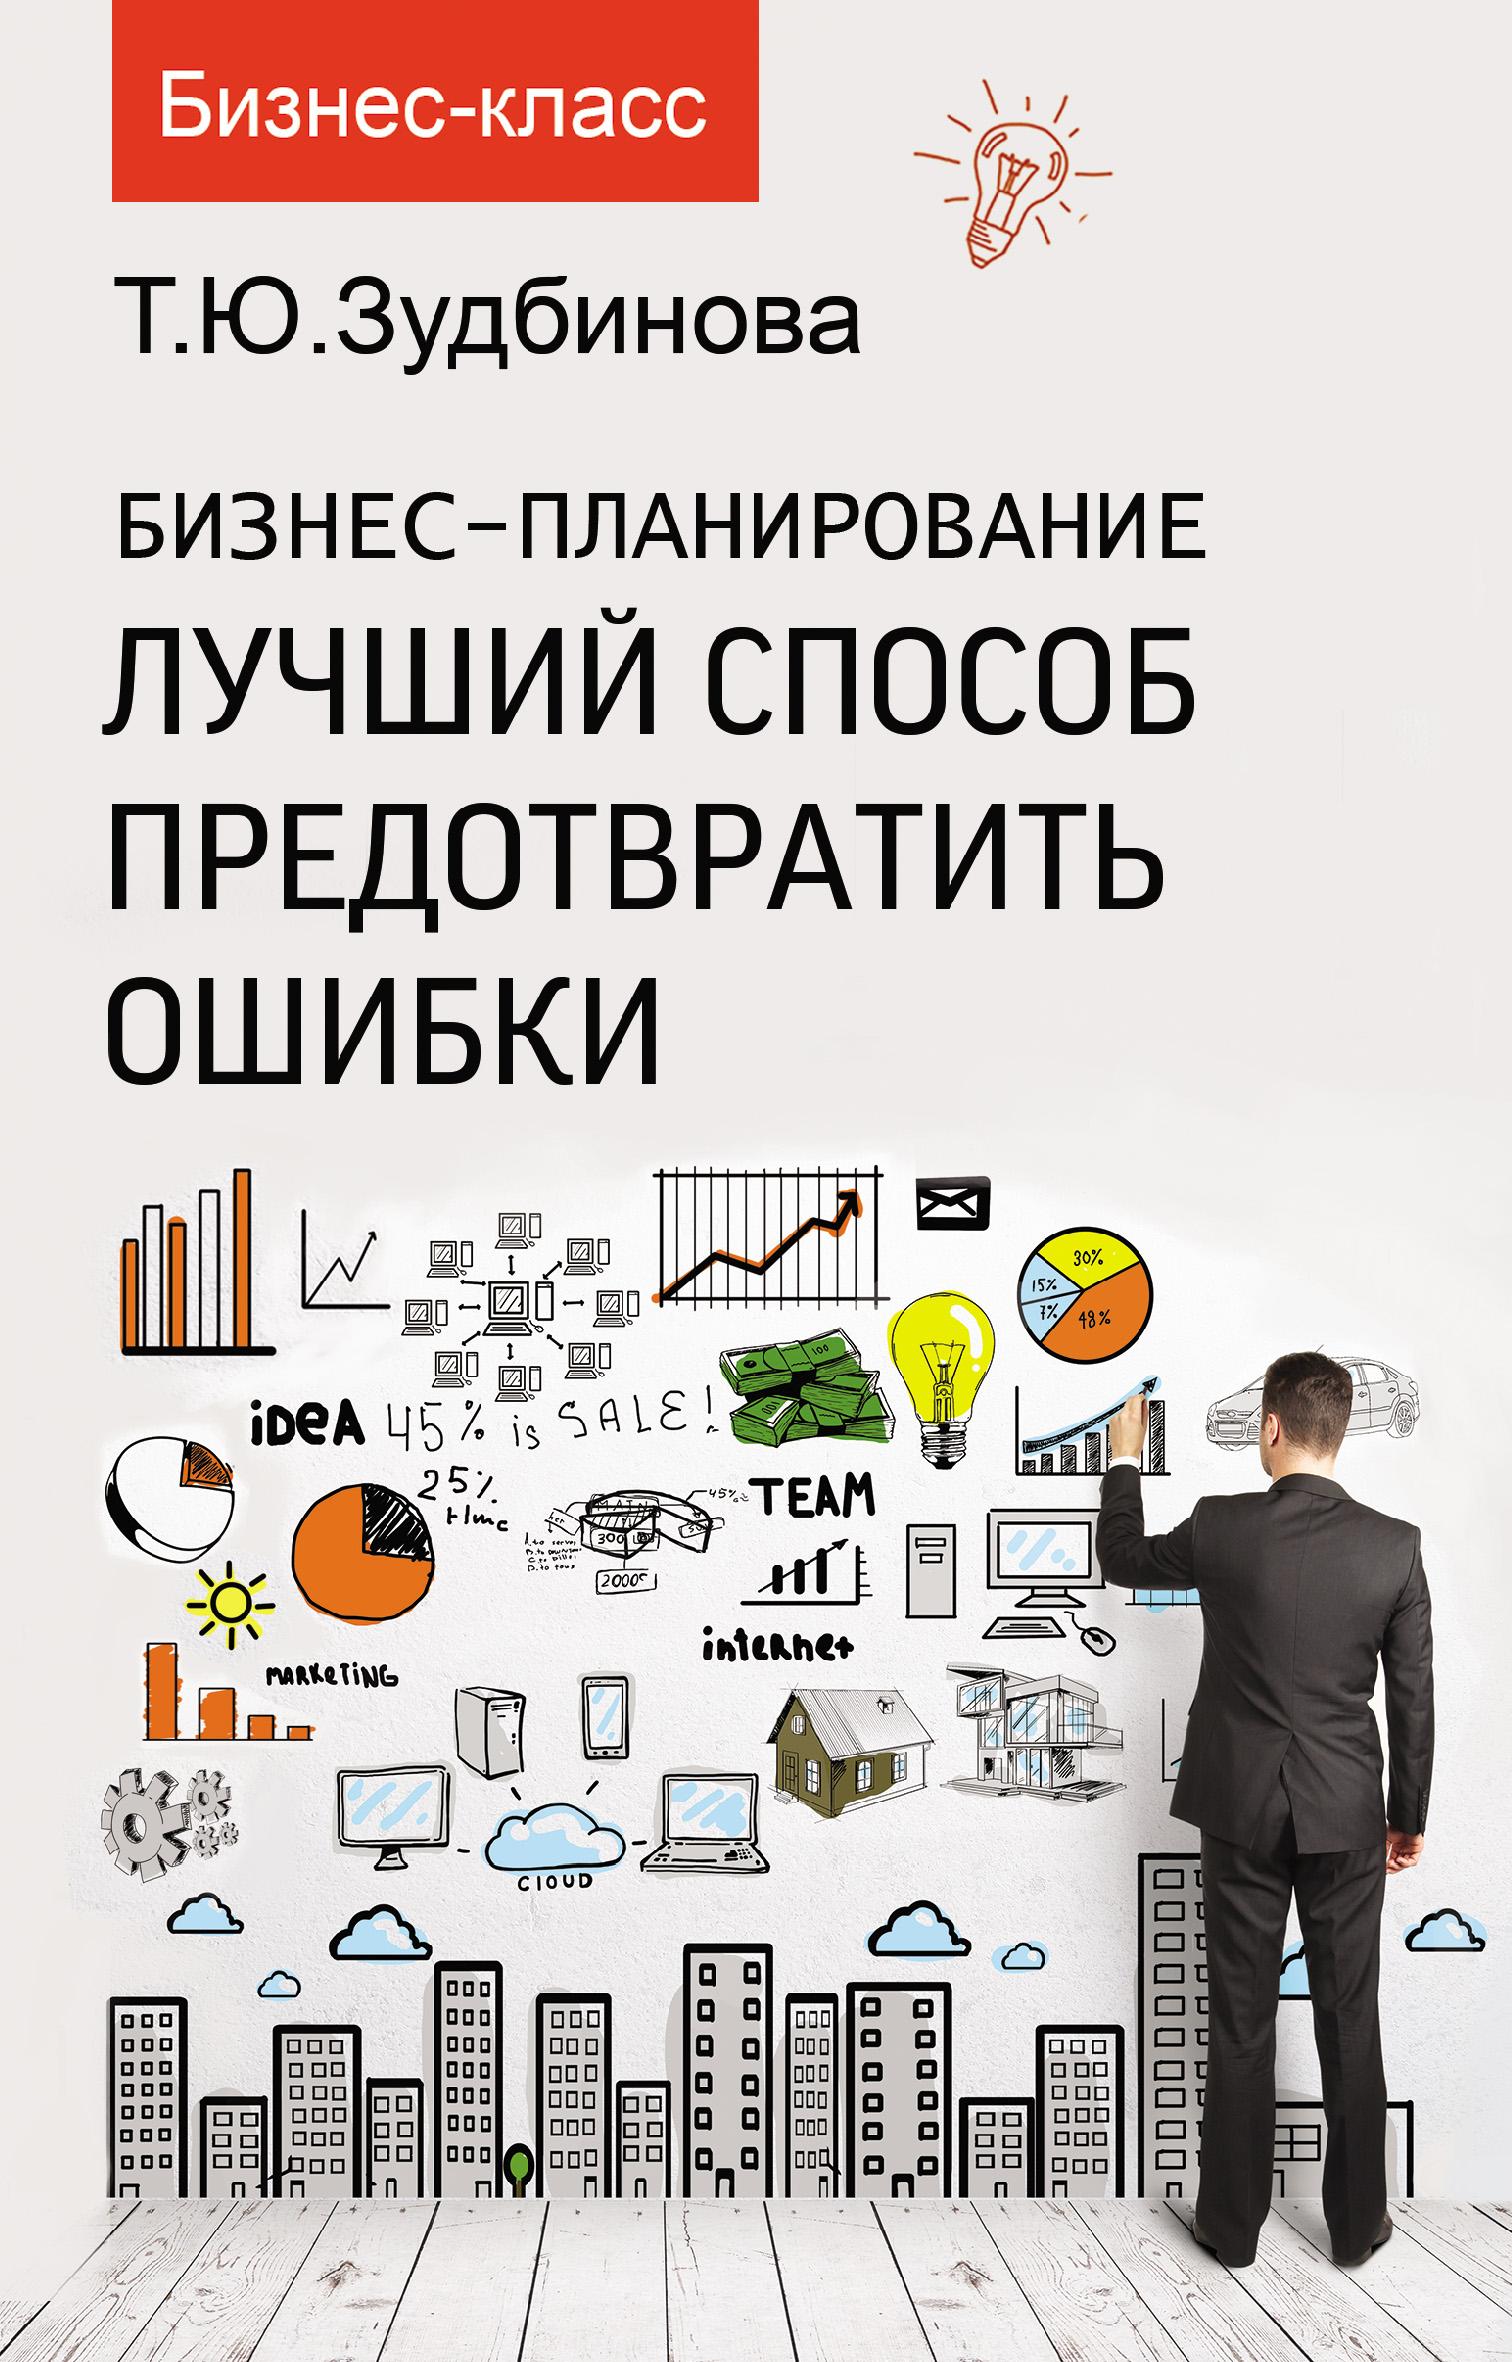 Т. Ю. Зудбинова Бизнес-планирование. Лучший способ предотвратить ошибки зудбинова тамара юрьевна бизнес планирование лучший способ предотвратить ошибки